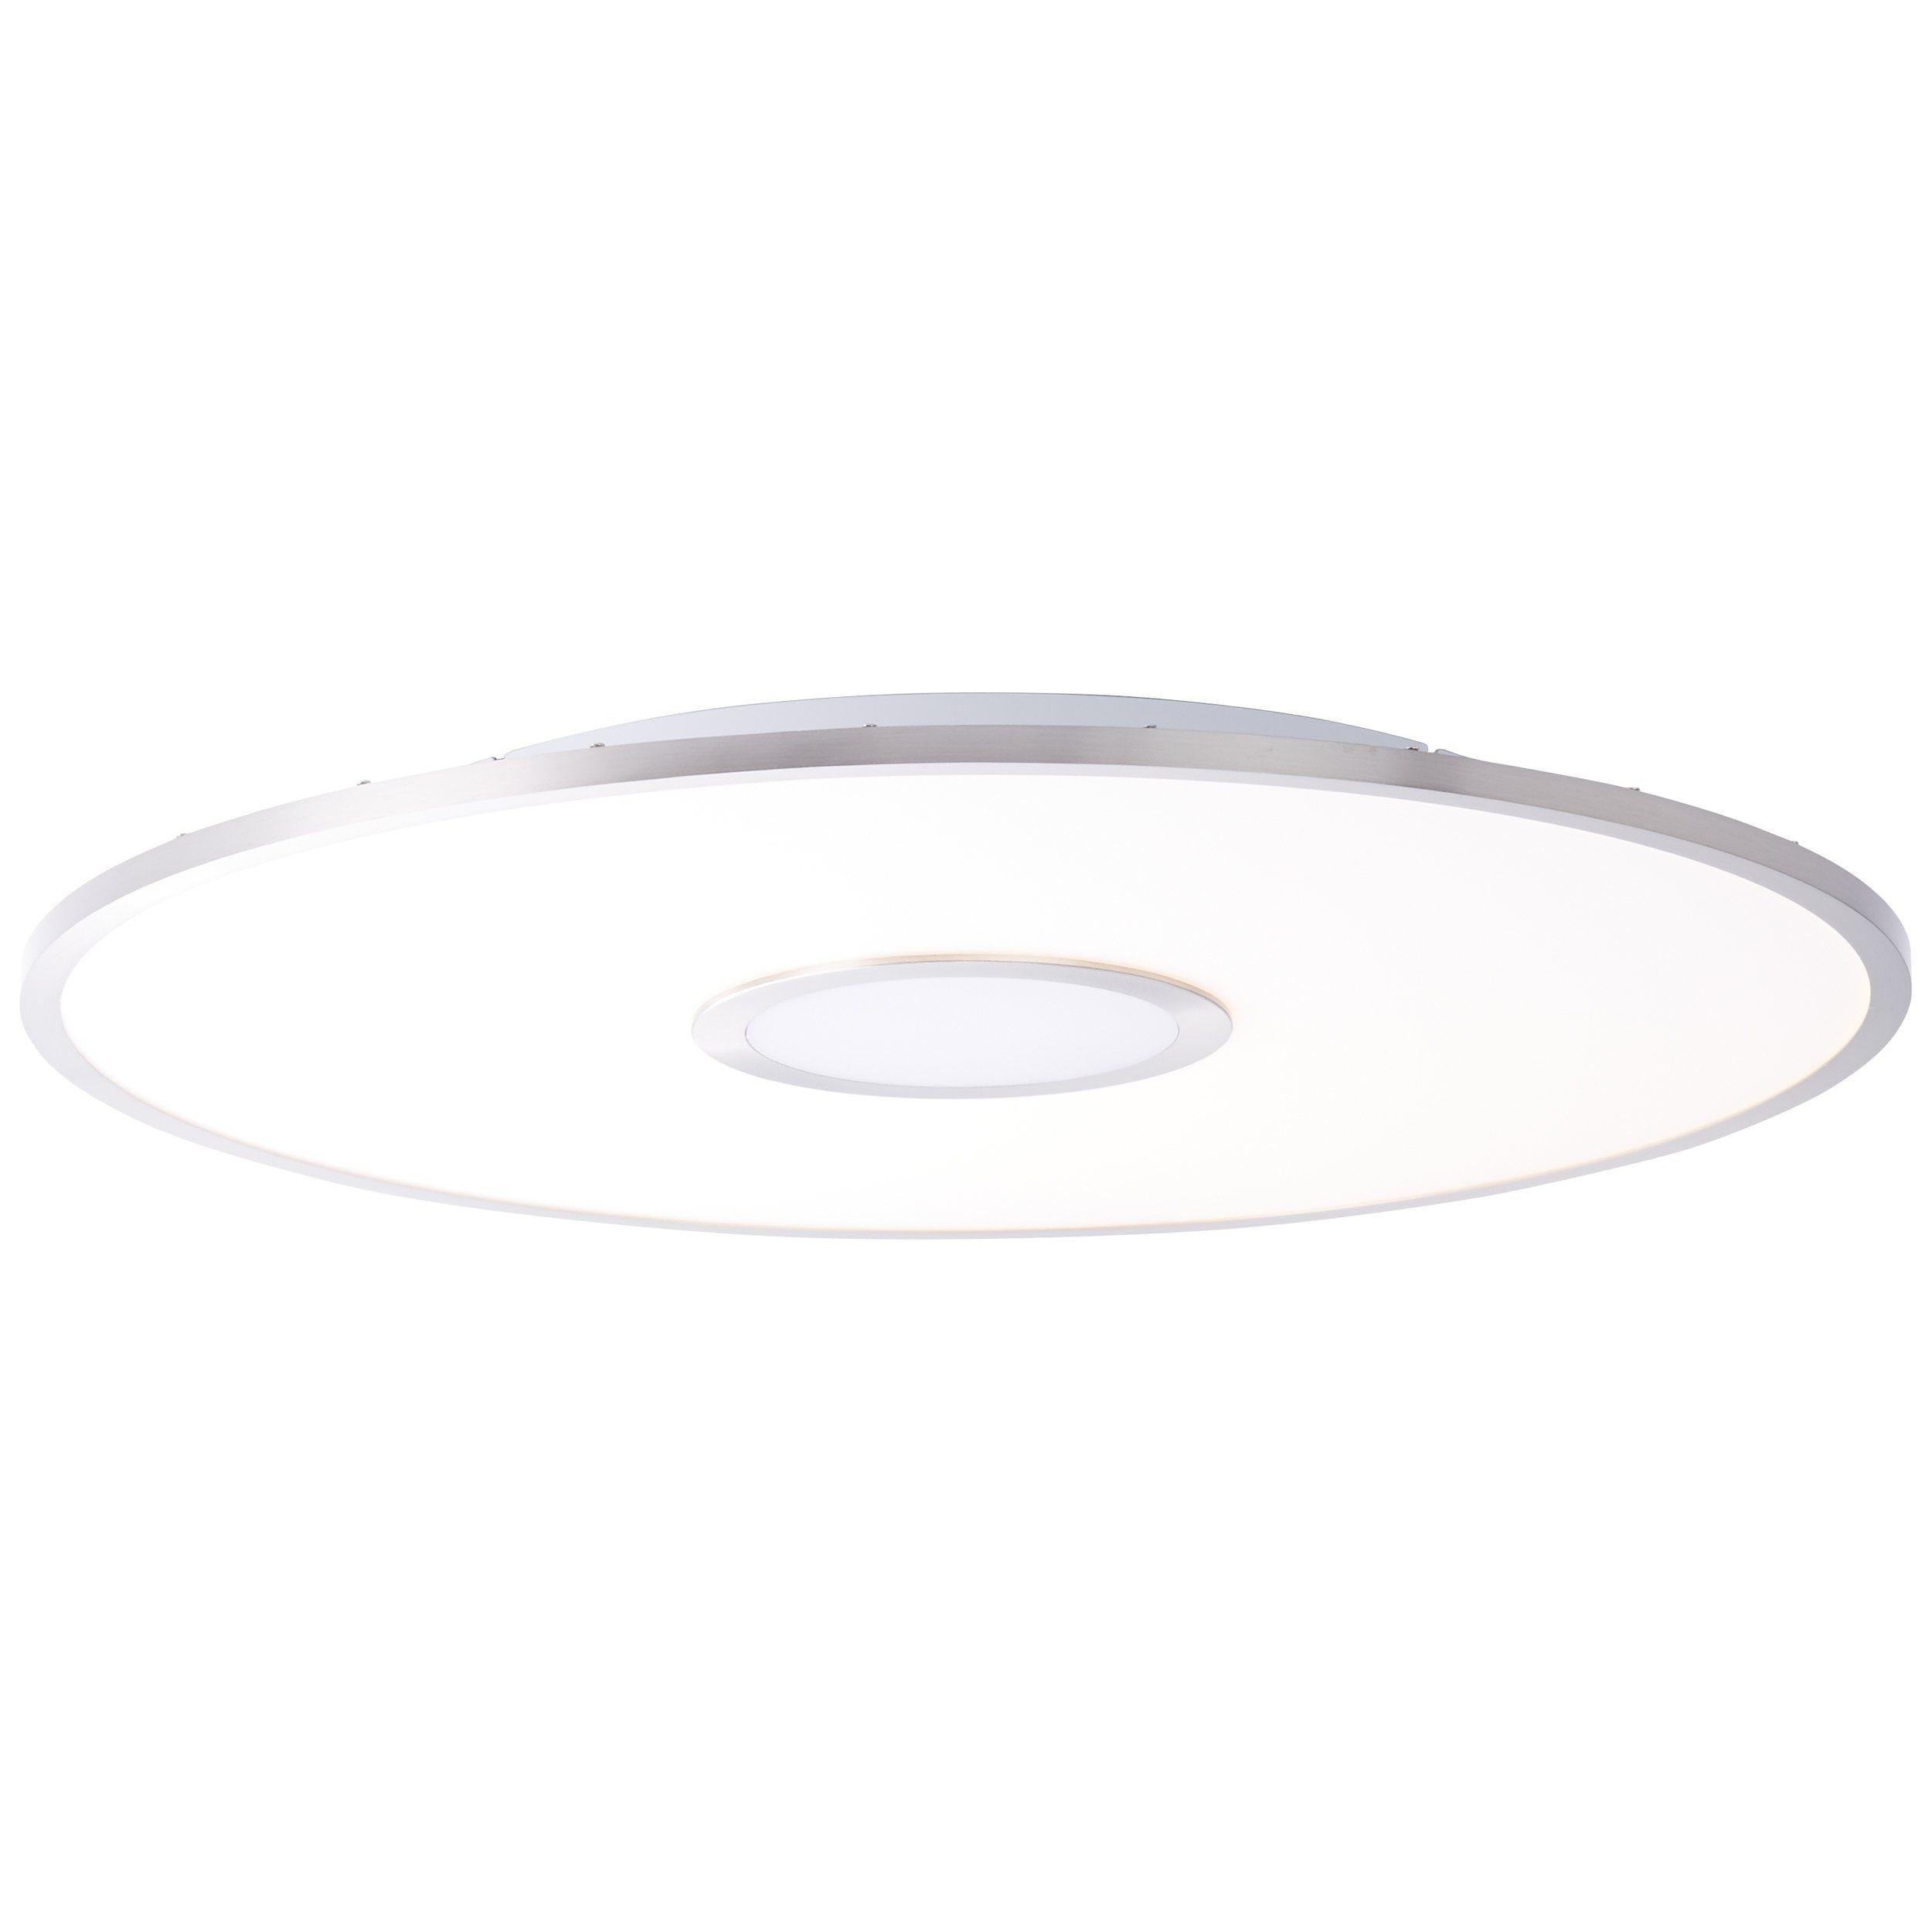 AEG Carmina LED Deckenaufbau-Paneel 60cm RGB nickel matt